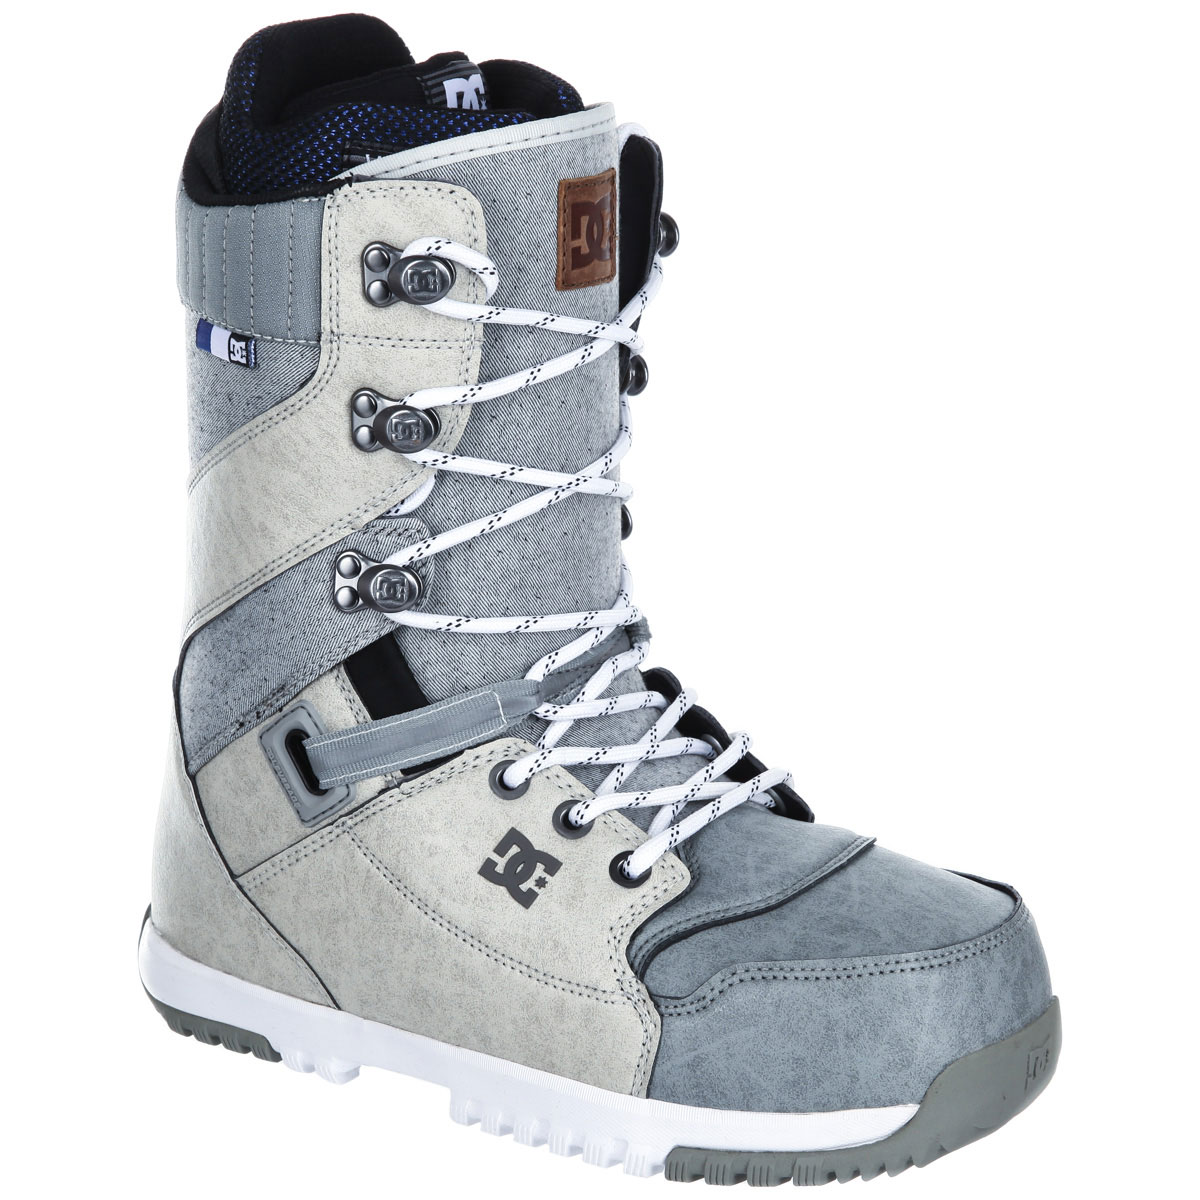 Купить ботинки для сноуборда DC Mutiny Silver Birch (ADYO200037-WEJ0) в  интернет-магазине Proskater.kz d17cf02a513